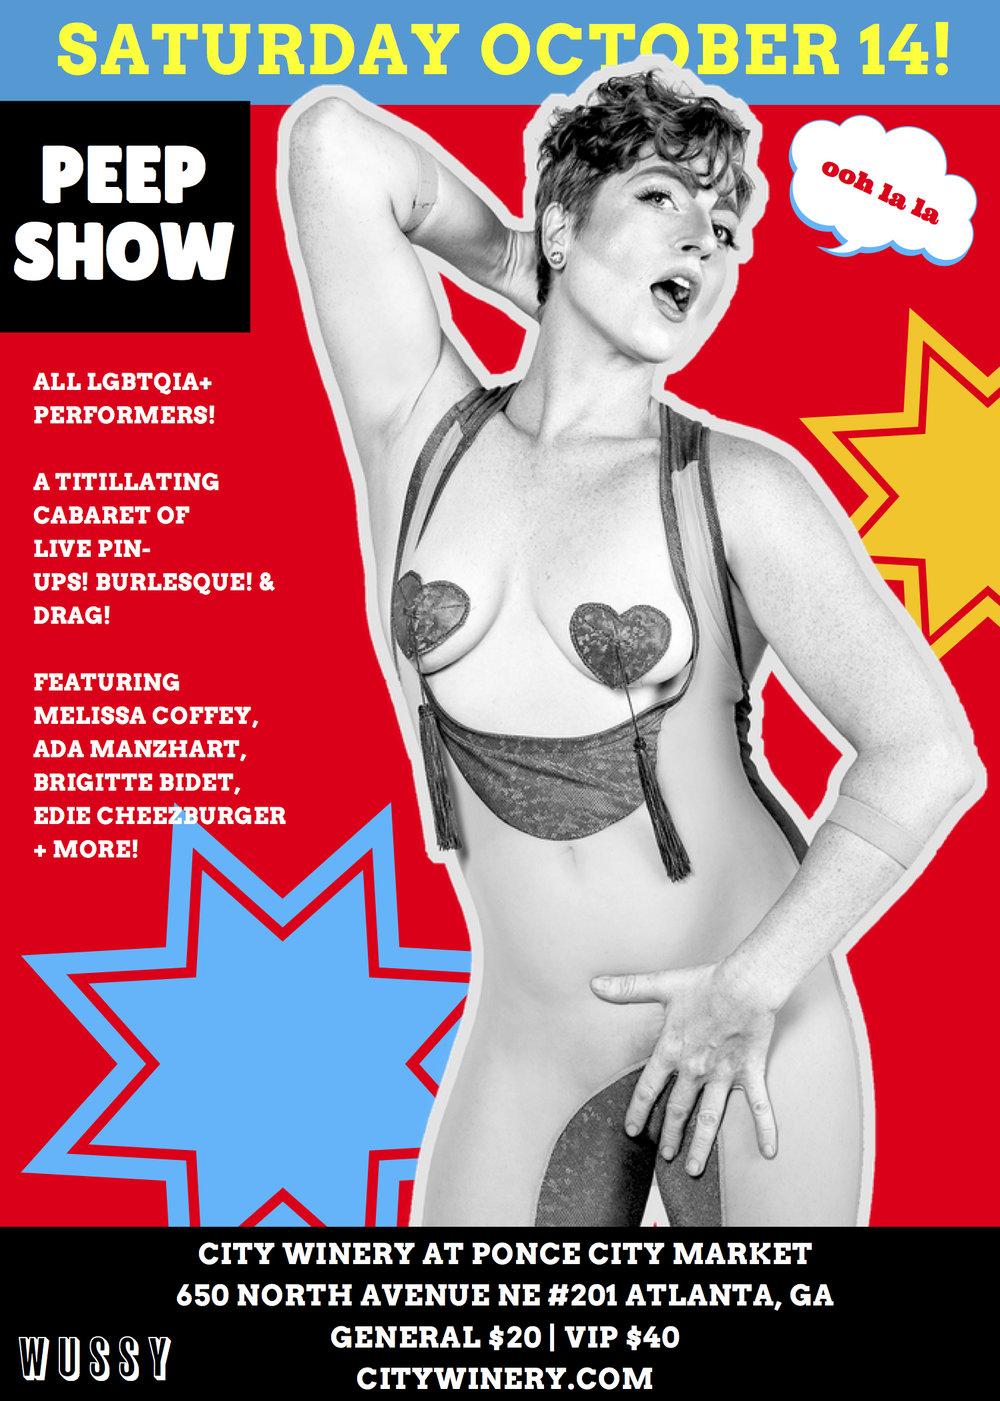 Peep Show Flyer.jpg